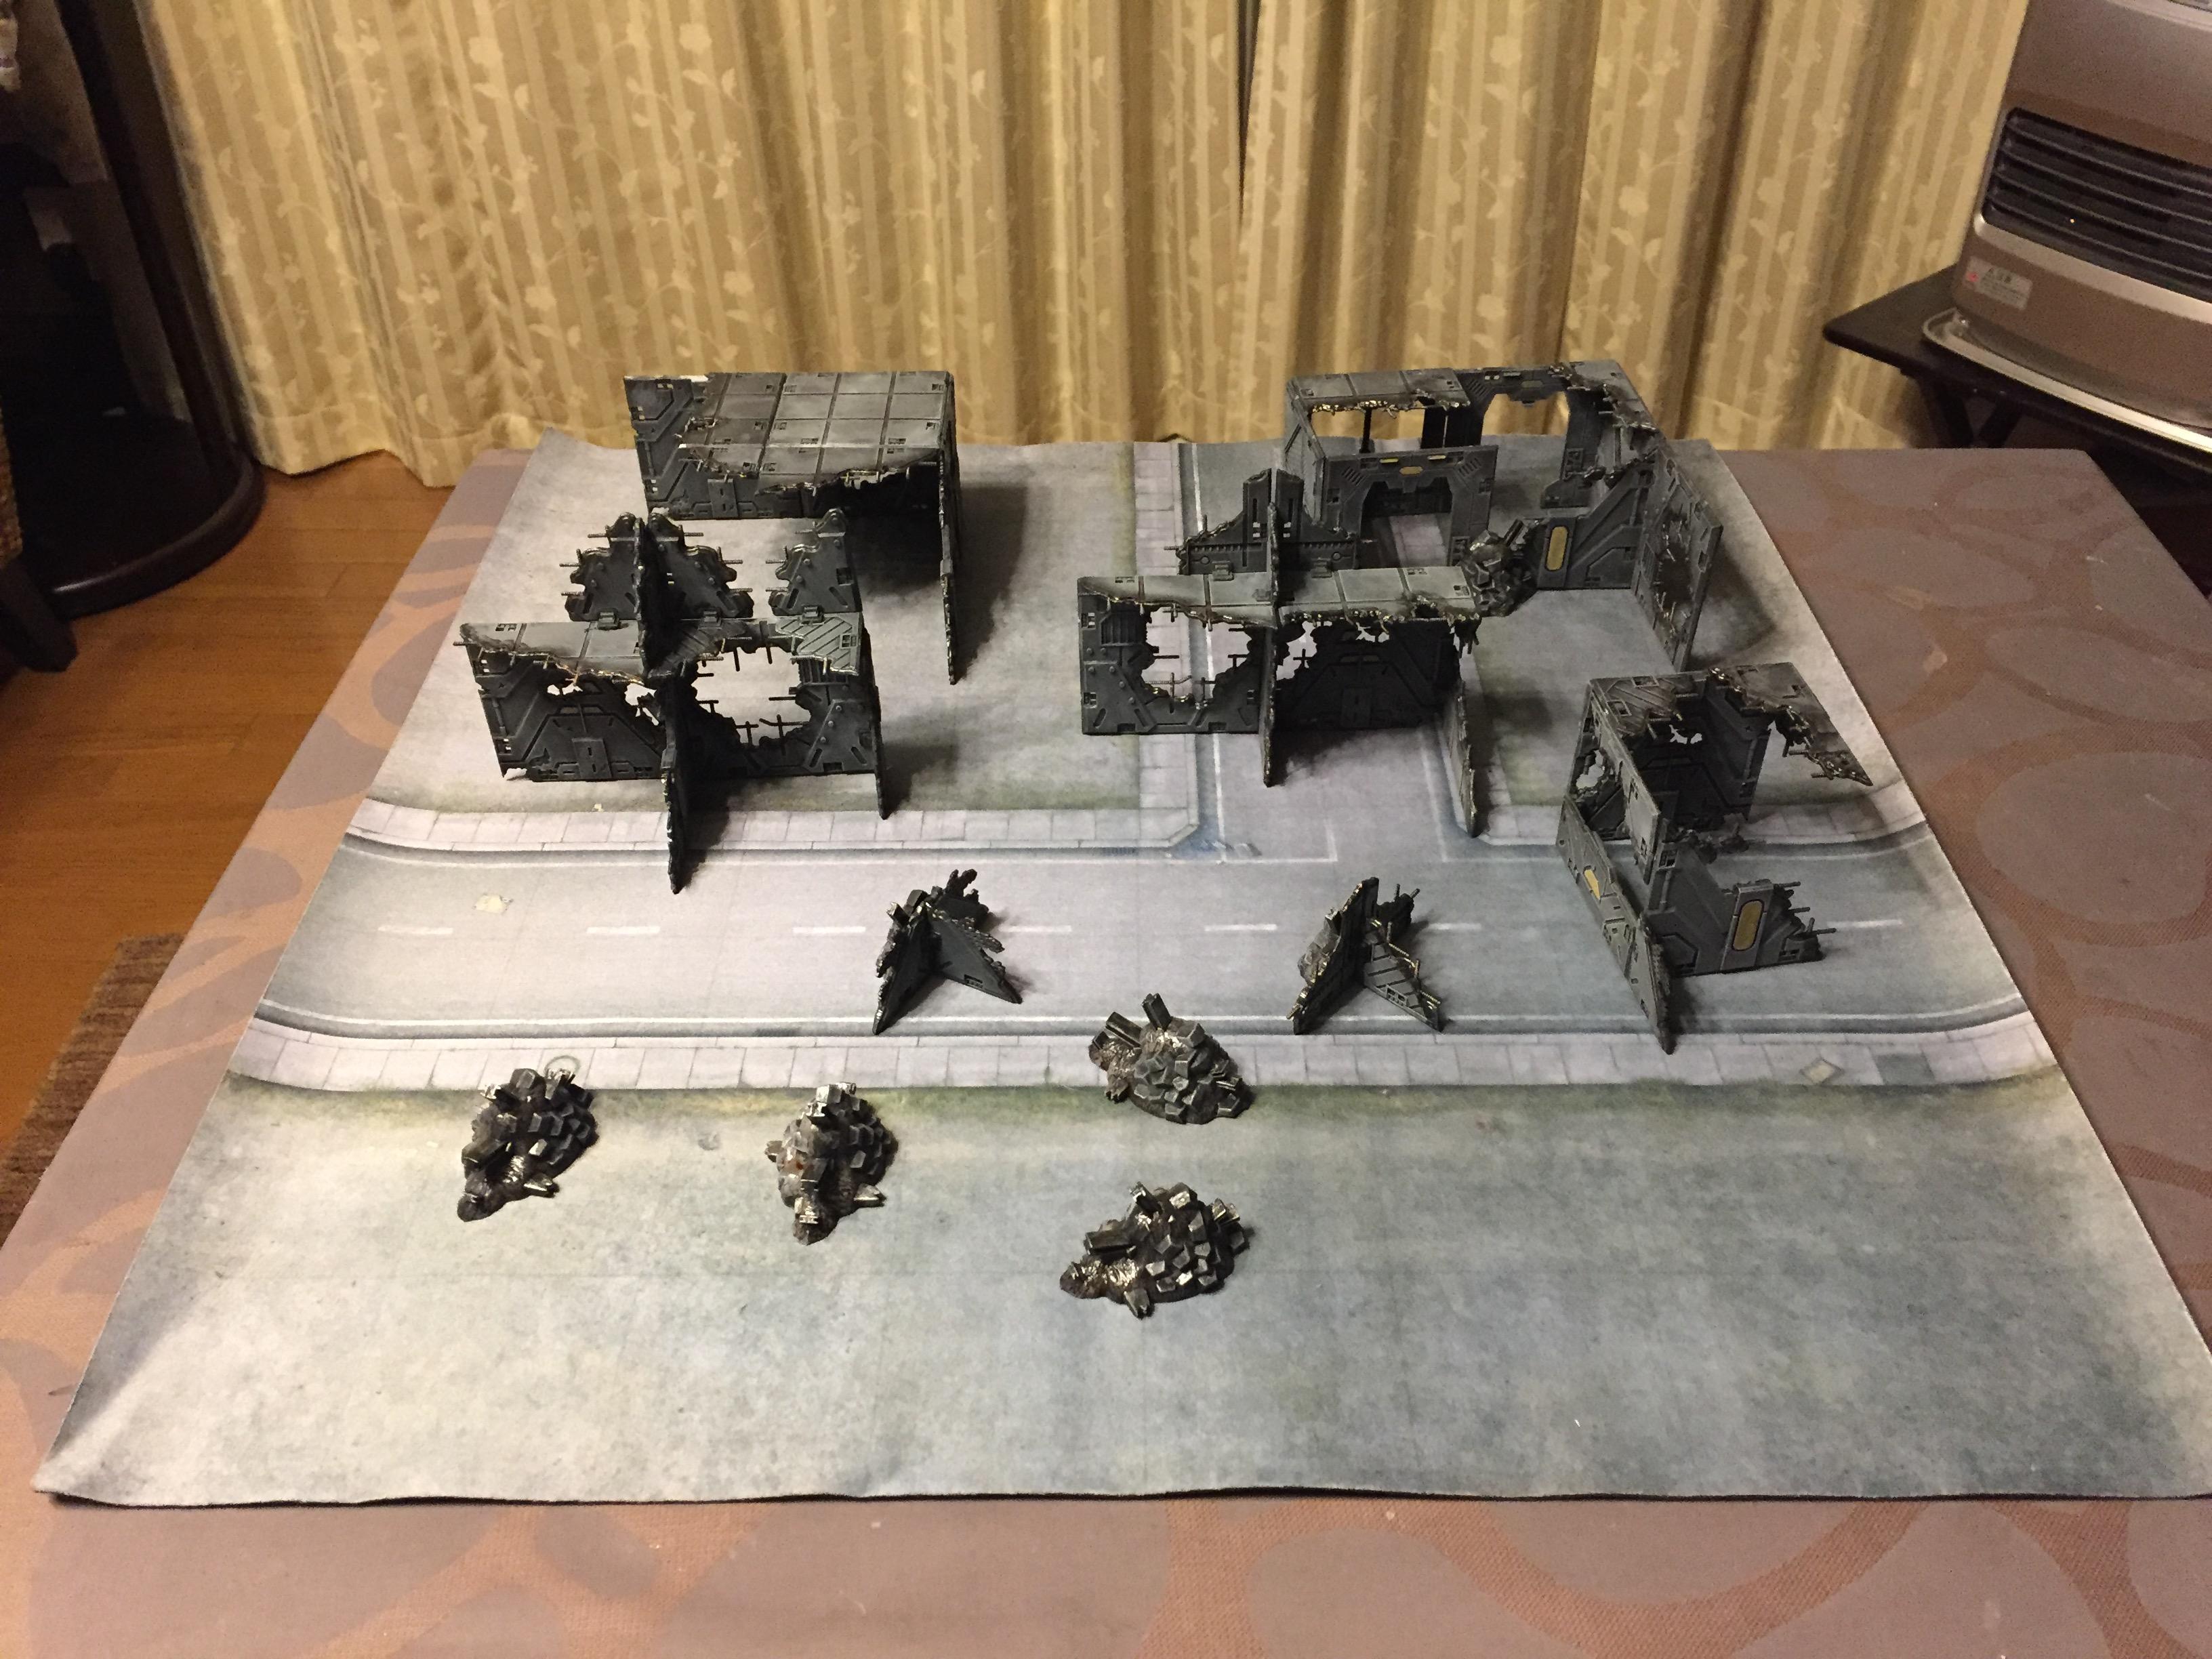 Battlezone. Battlezones, Buildings, Deadzone, January 2018, Mantic, Ruins, Terrain